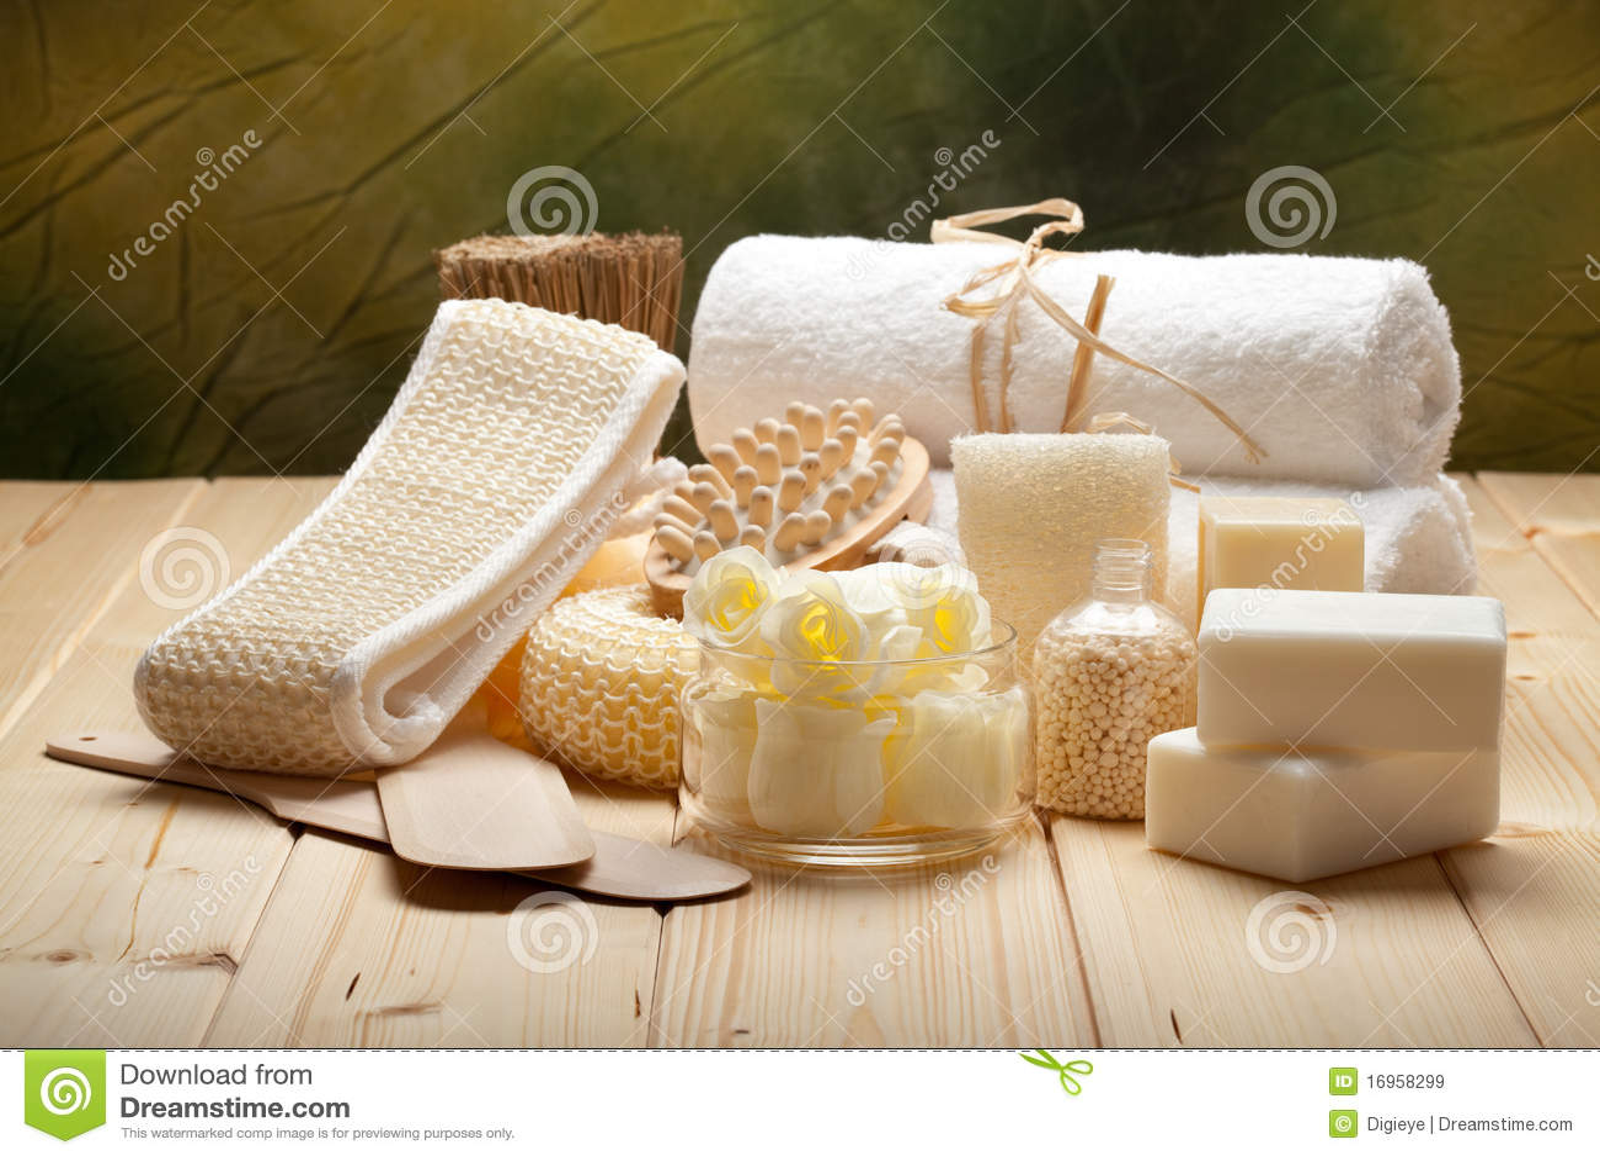 Massage Tools Soap Bath Salt And Towels Royalty Free